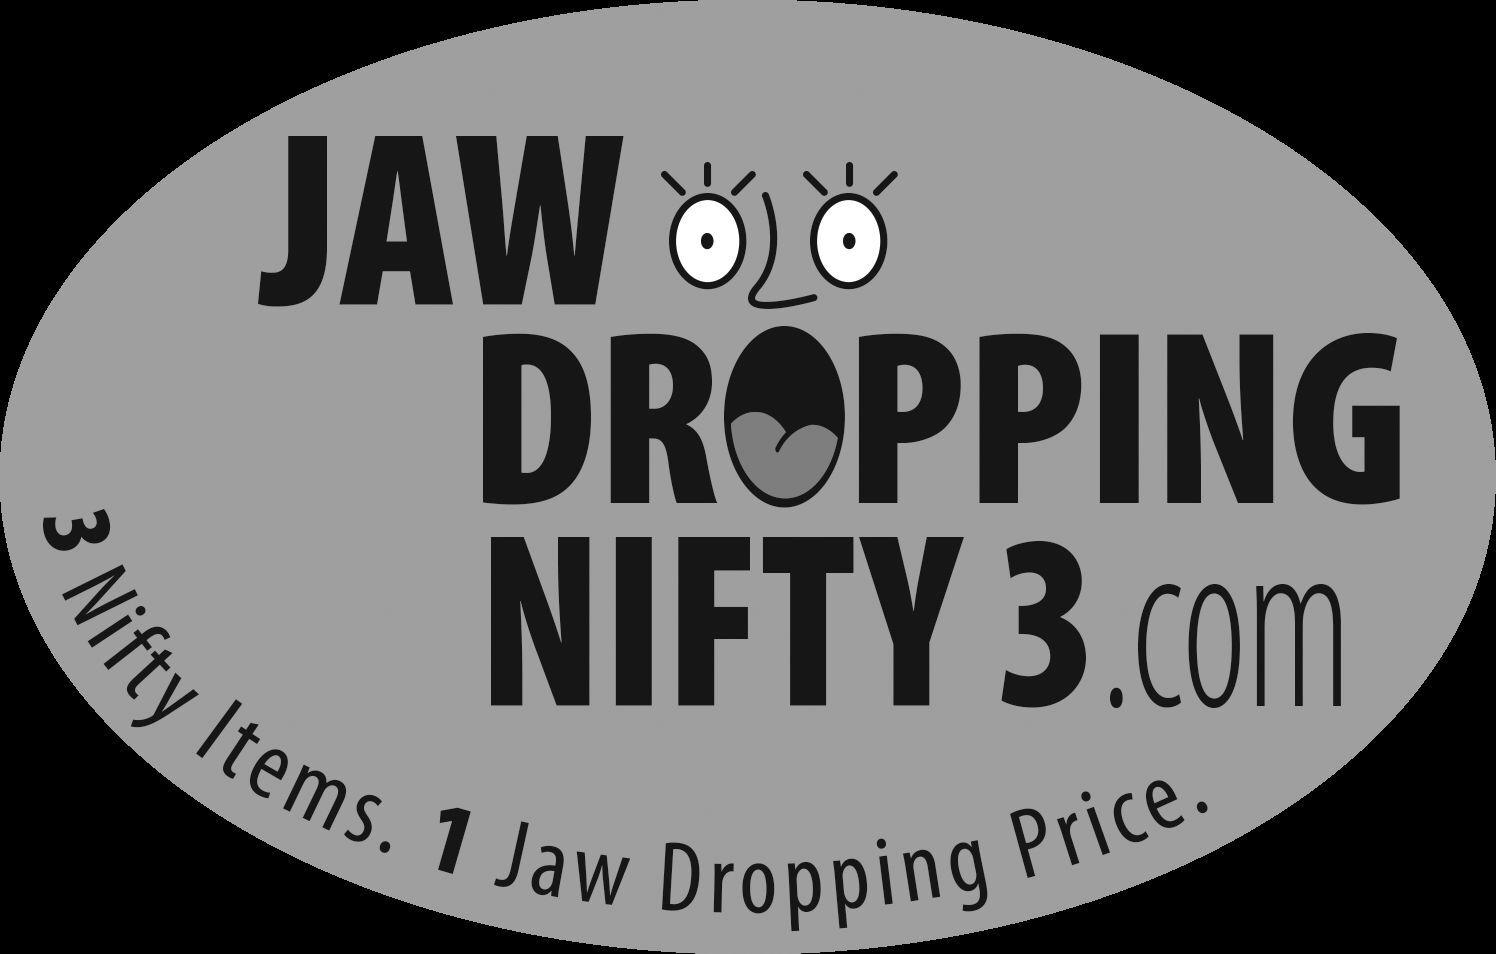 JawDroppingNifty3.com